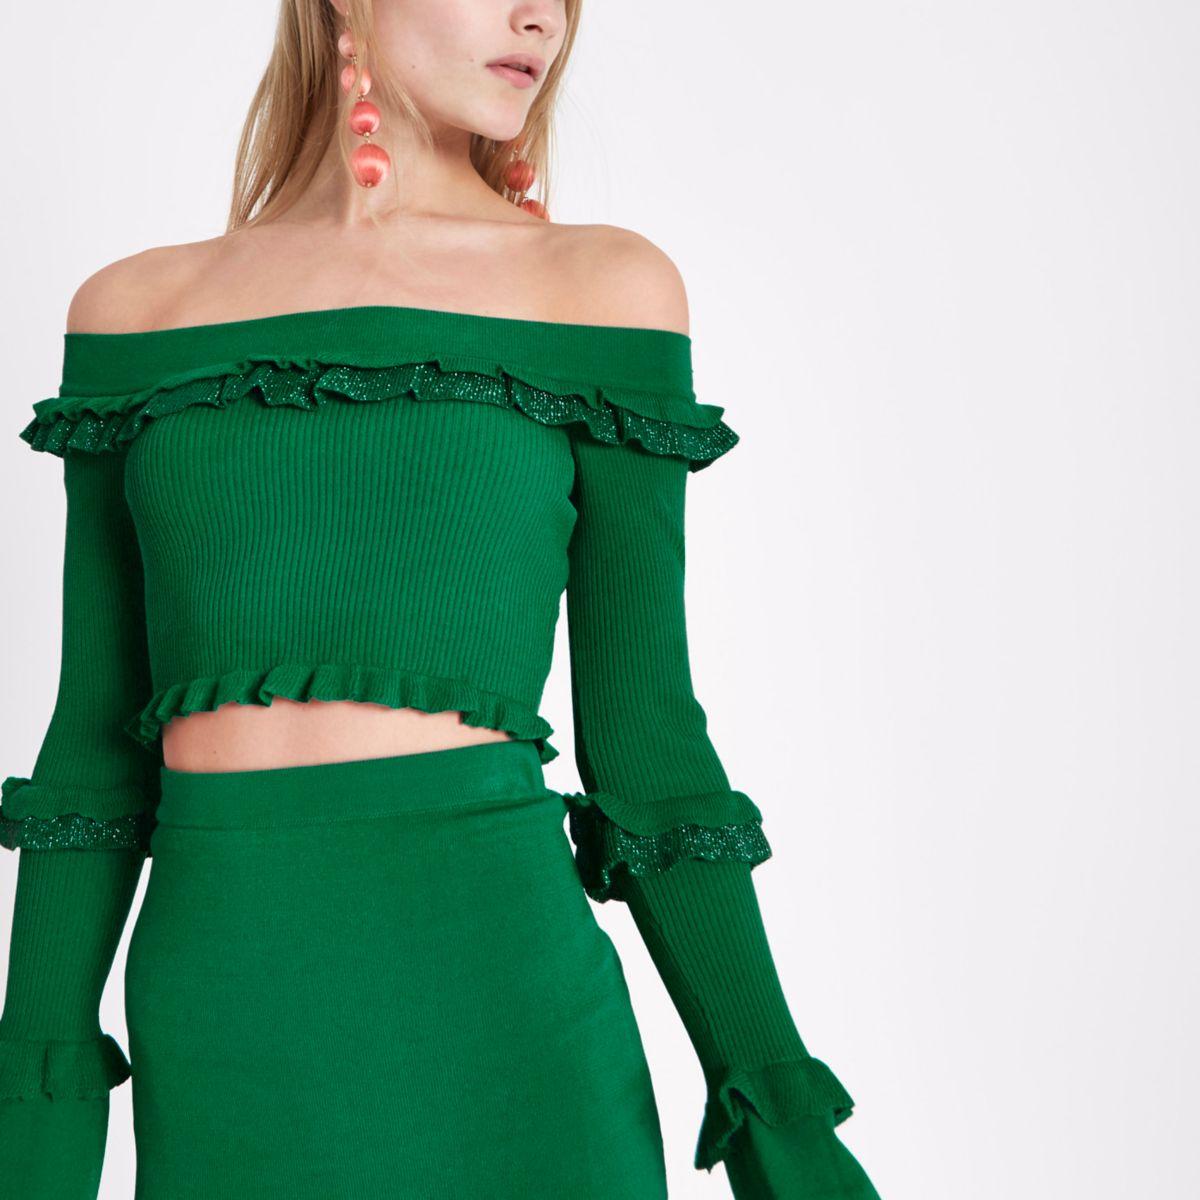 Green glitter knit frill bardot crop top